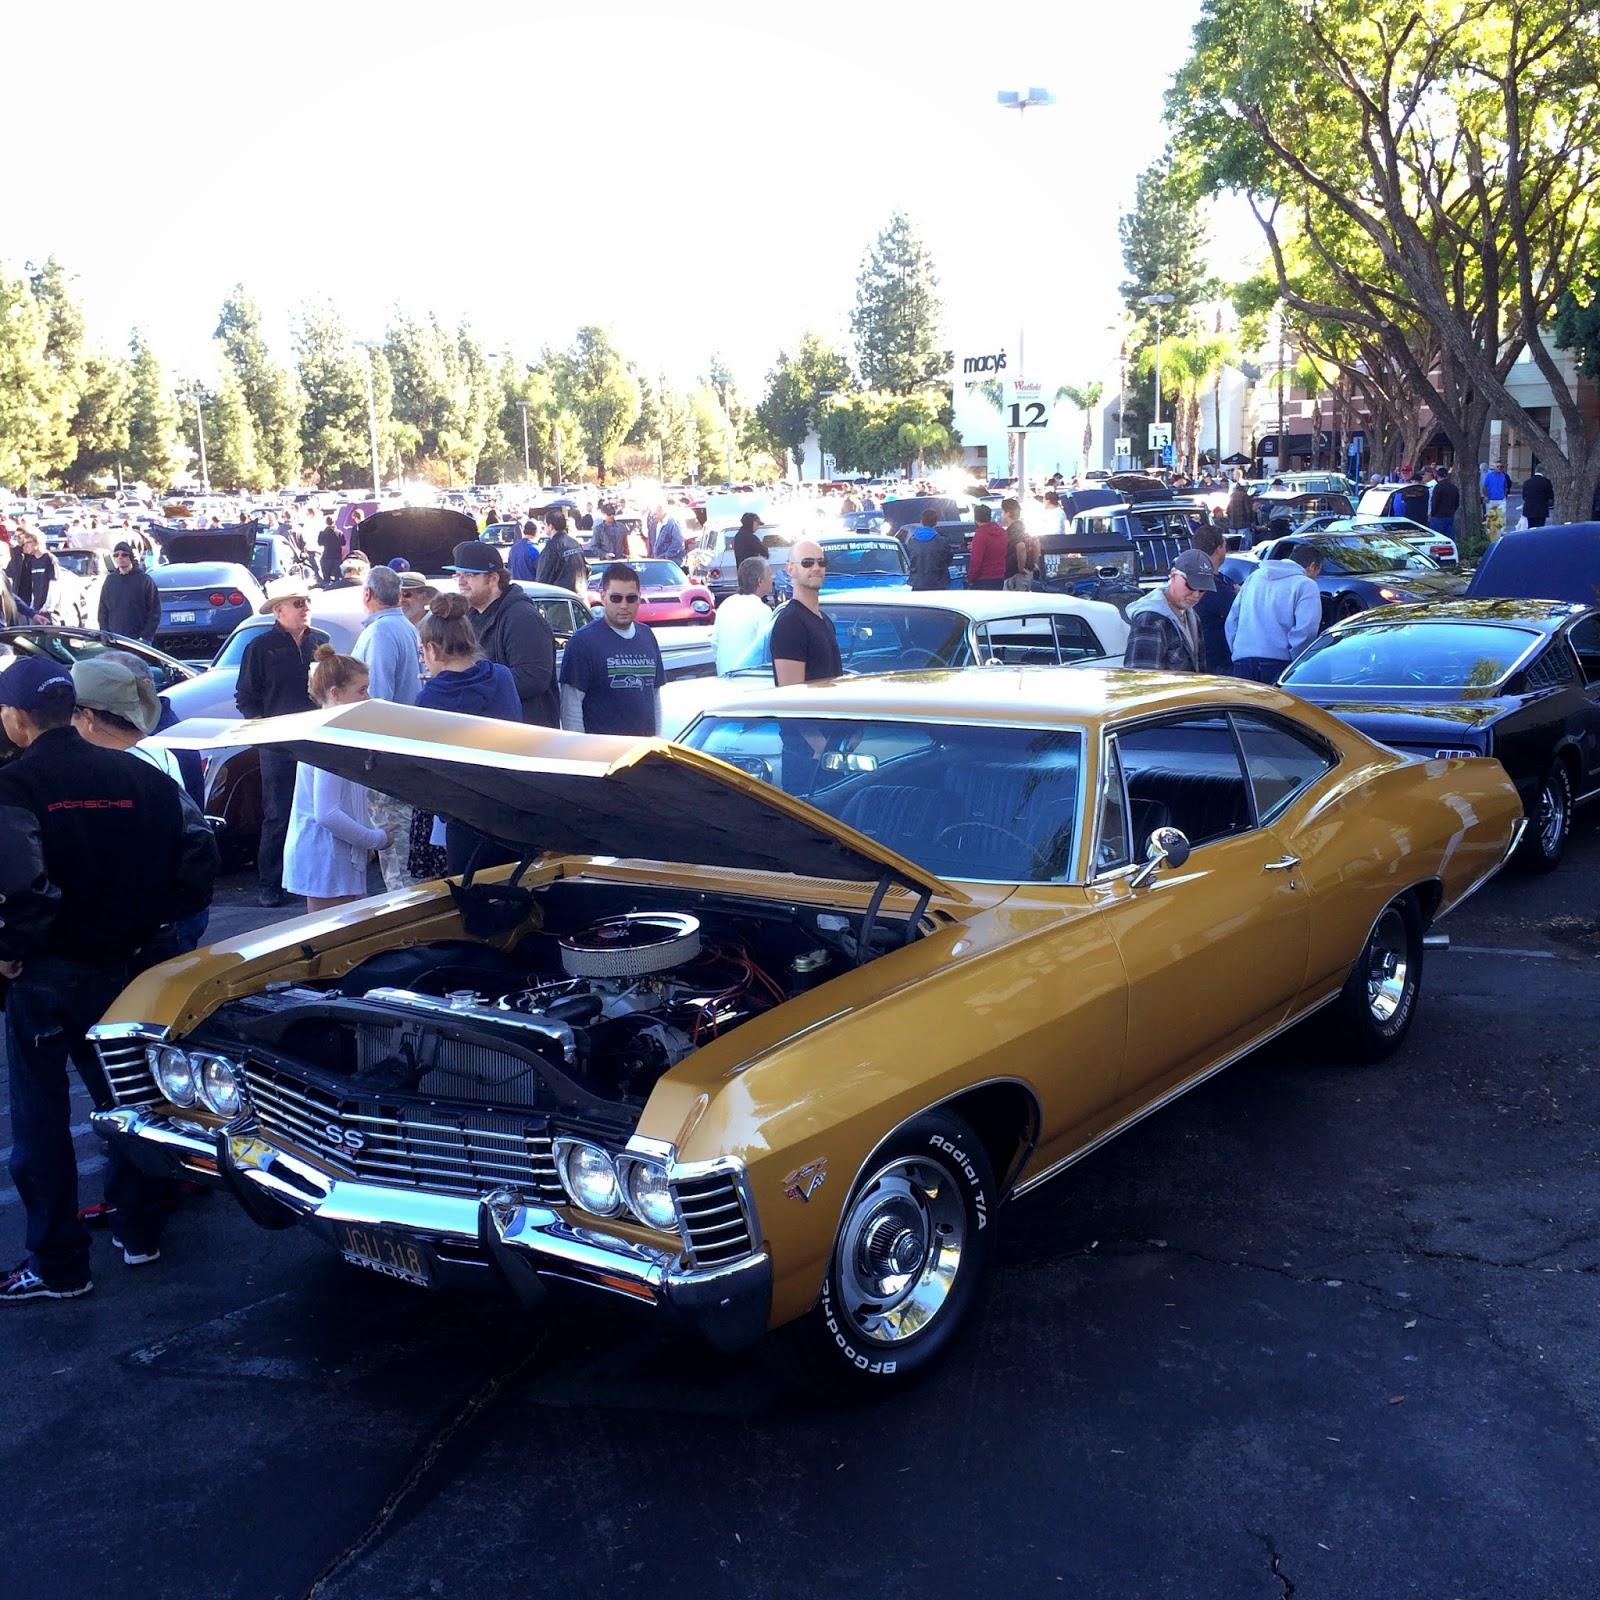 Covering Classic Cars Supercar Sunday Dia De Los Muertos Car - California car shows